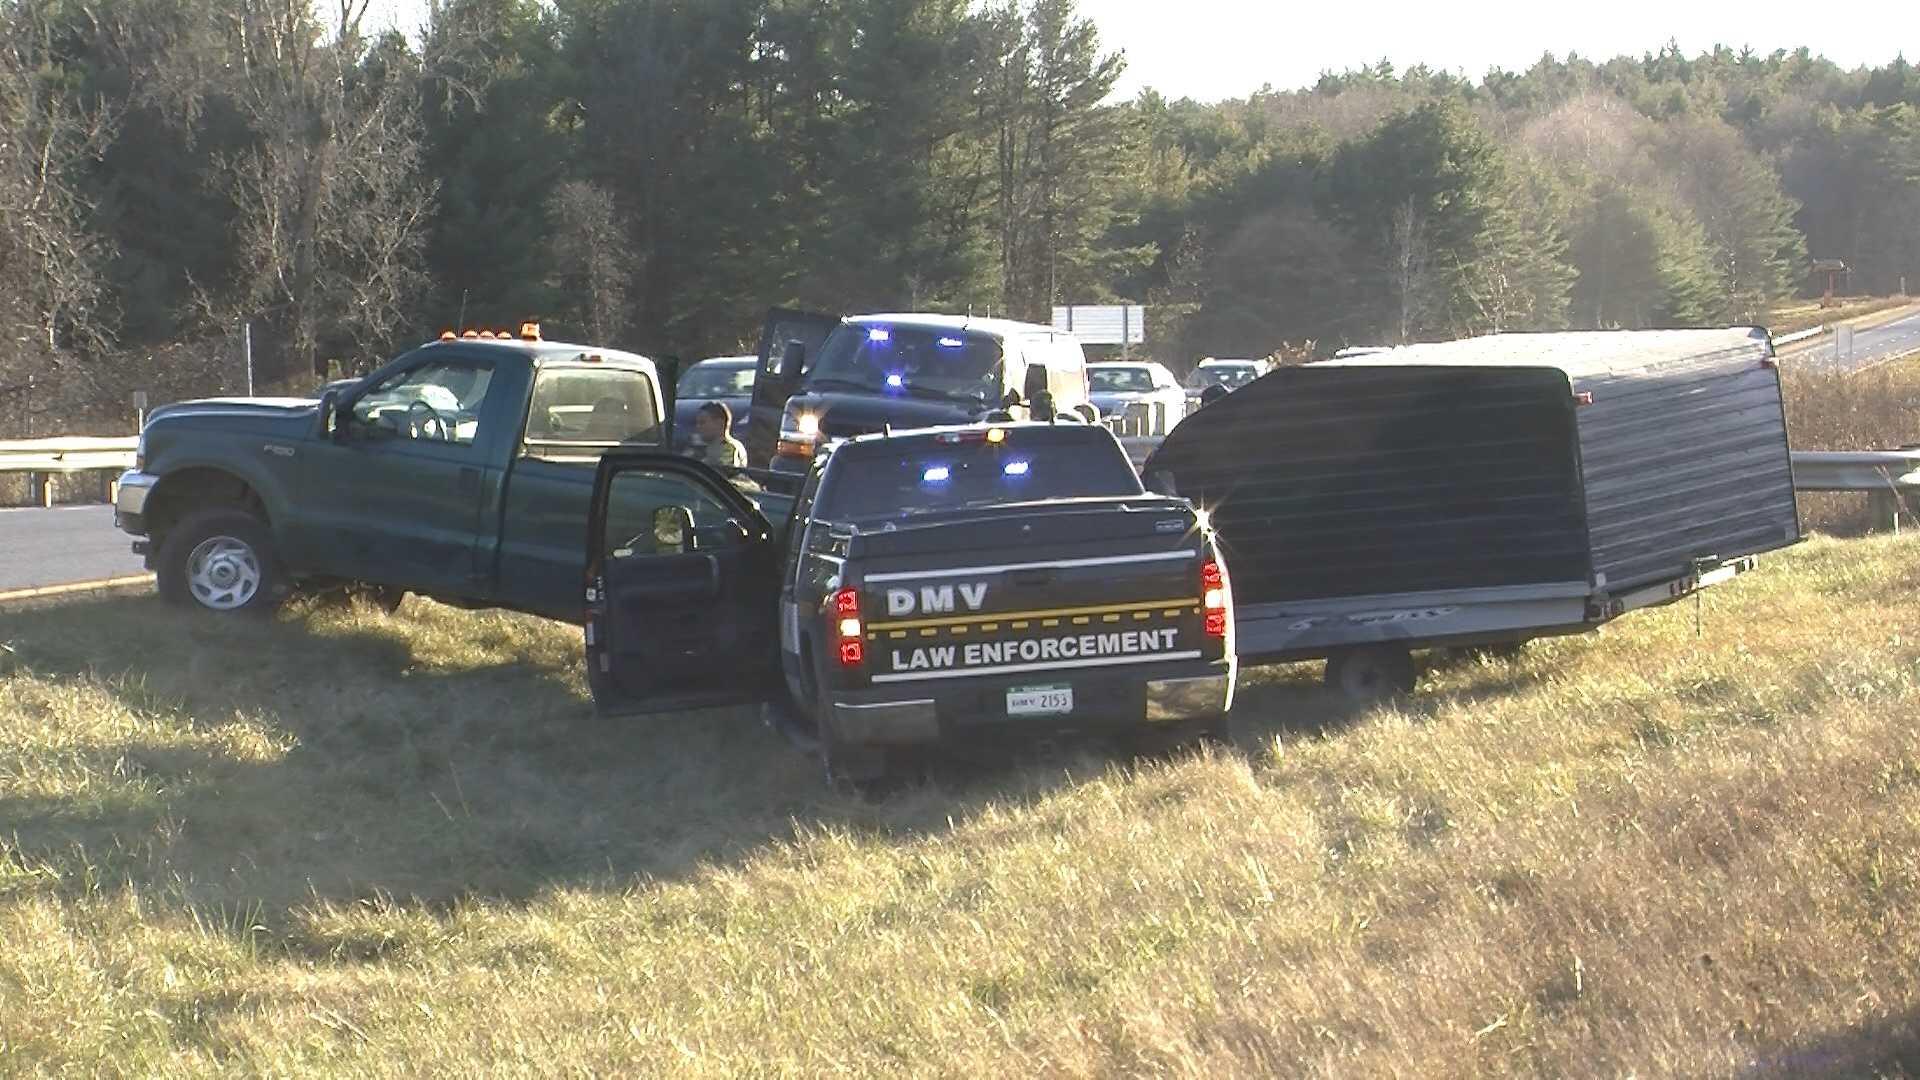 11-20-13 Police pursuit ends in highway median - img